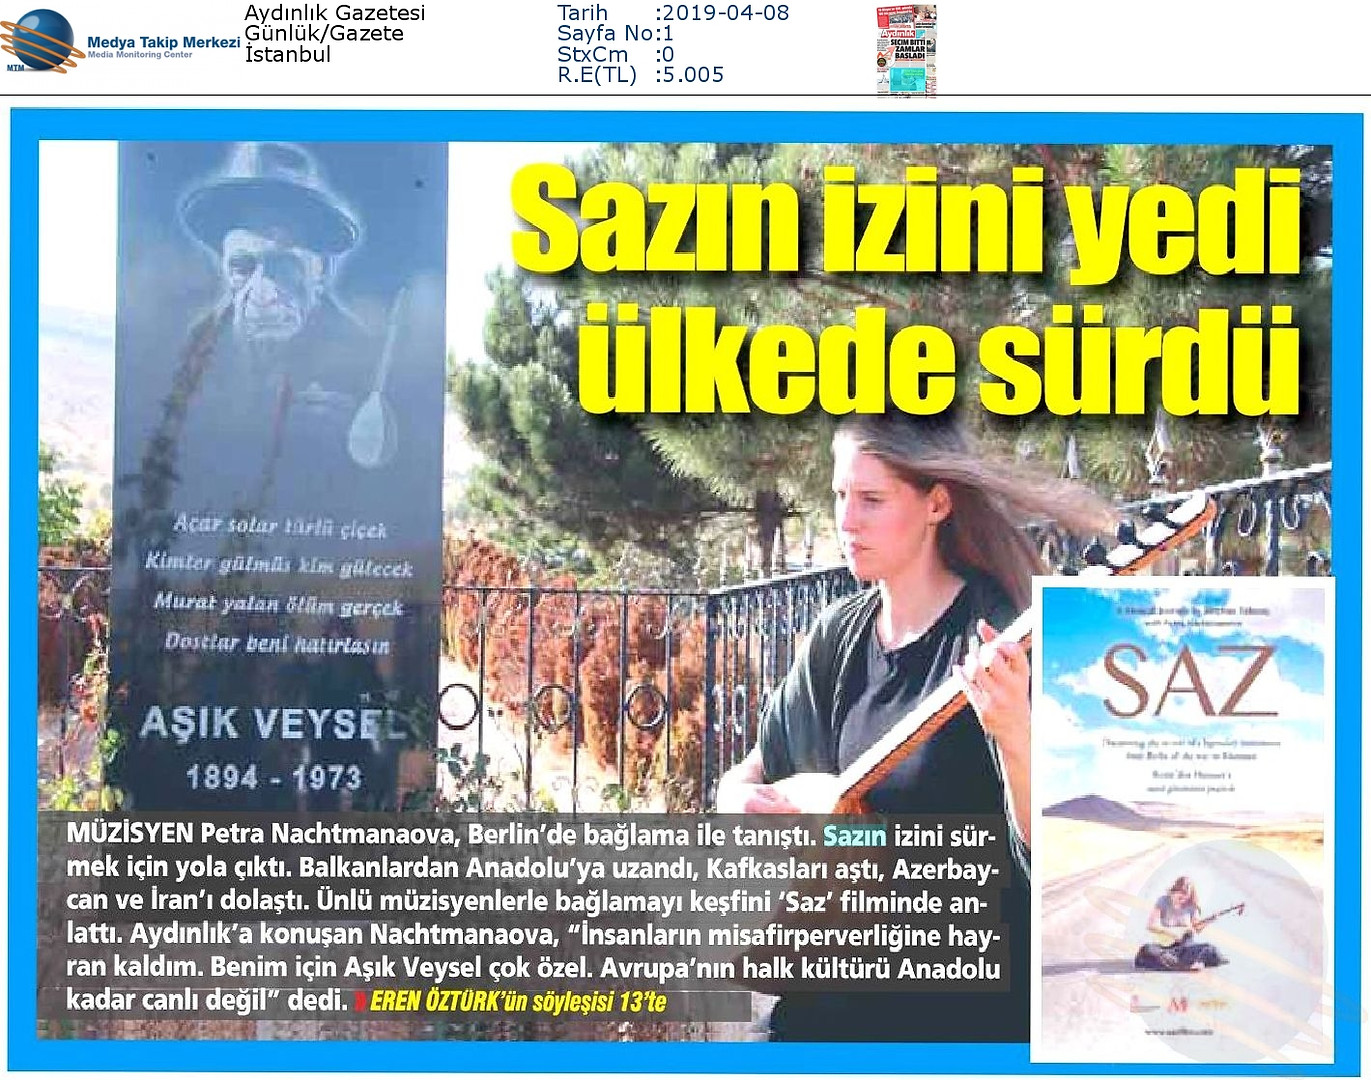 Aydýnlýk_Gazetesi-SAZIN_ÝZÝNÝ_YEDÝ_ÜLKED